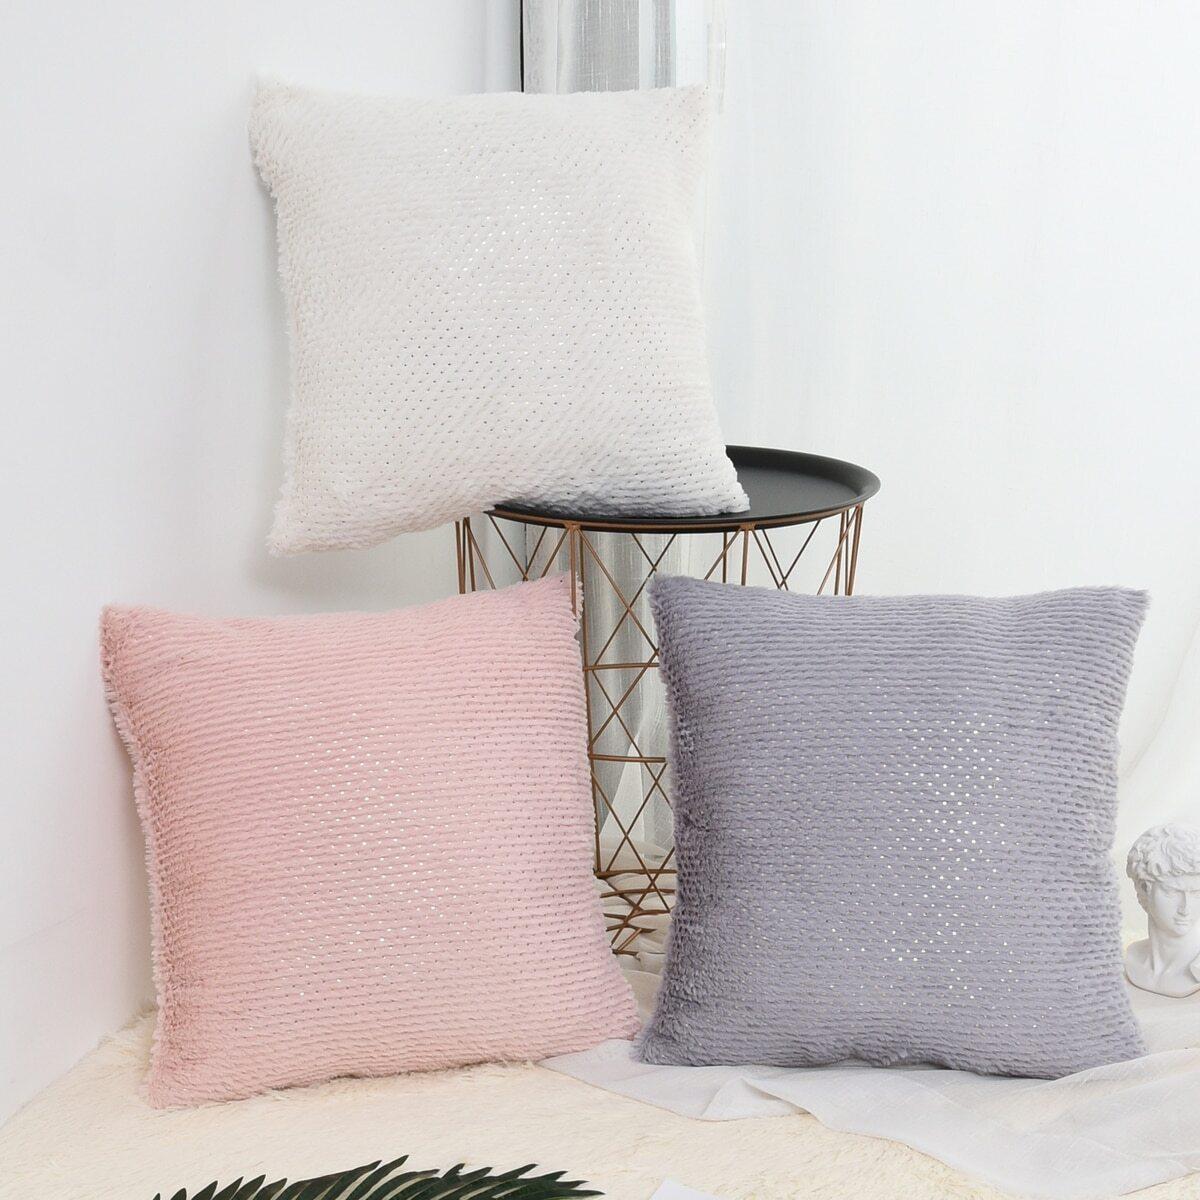 SHEIN coupon: Plain Plush Cushion Cover 1pc